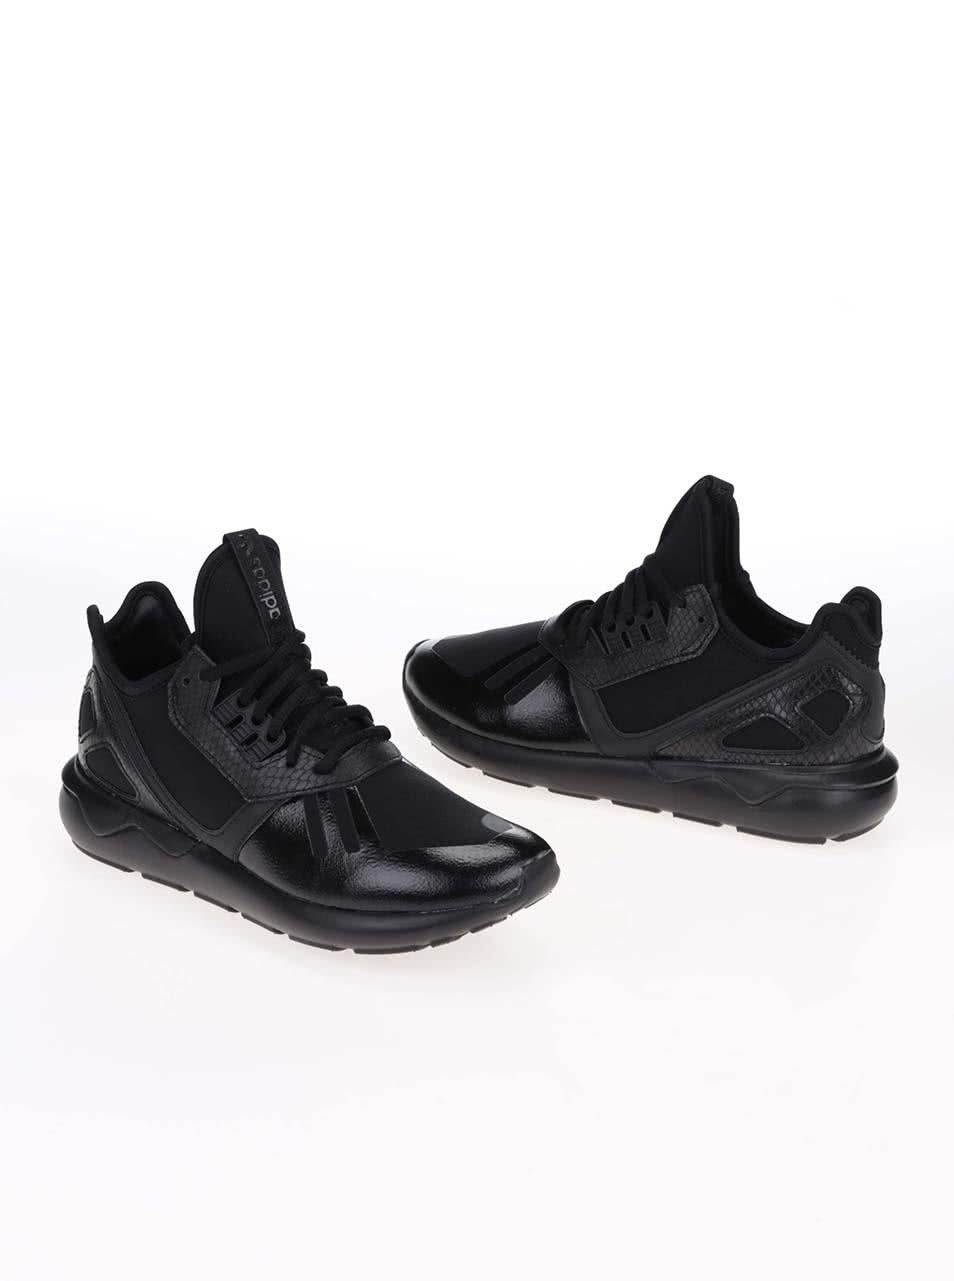 new arrival 1d793 9de51 Pantofi sport de dama adidas Originals Tubular Runner W negri ...